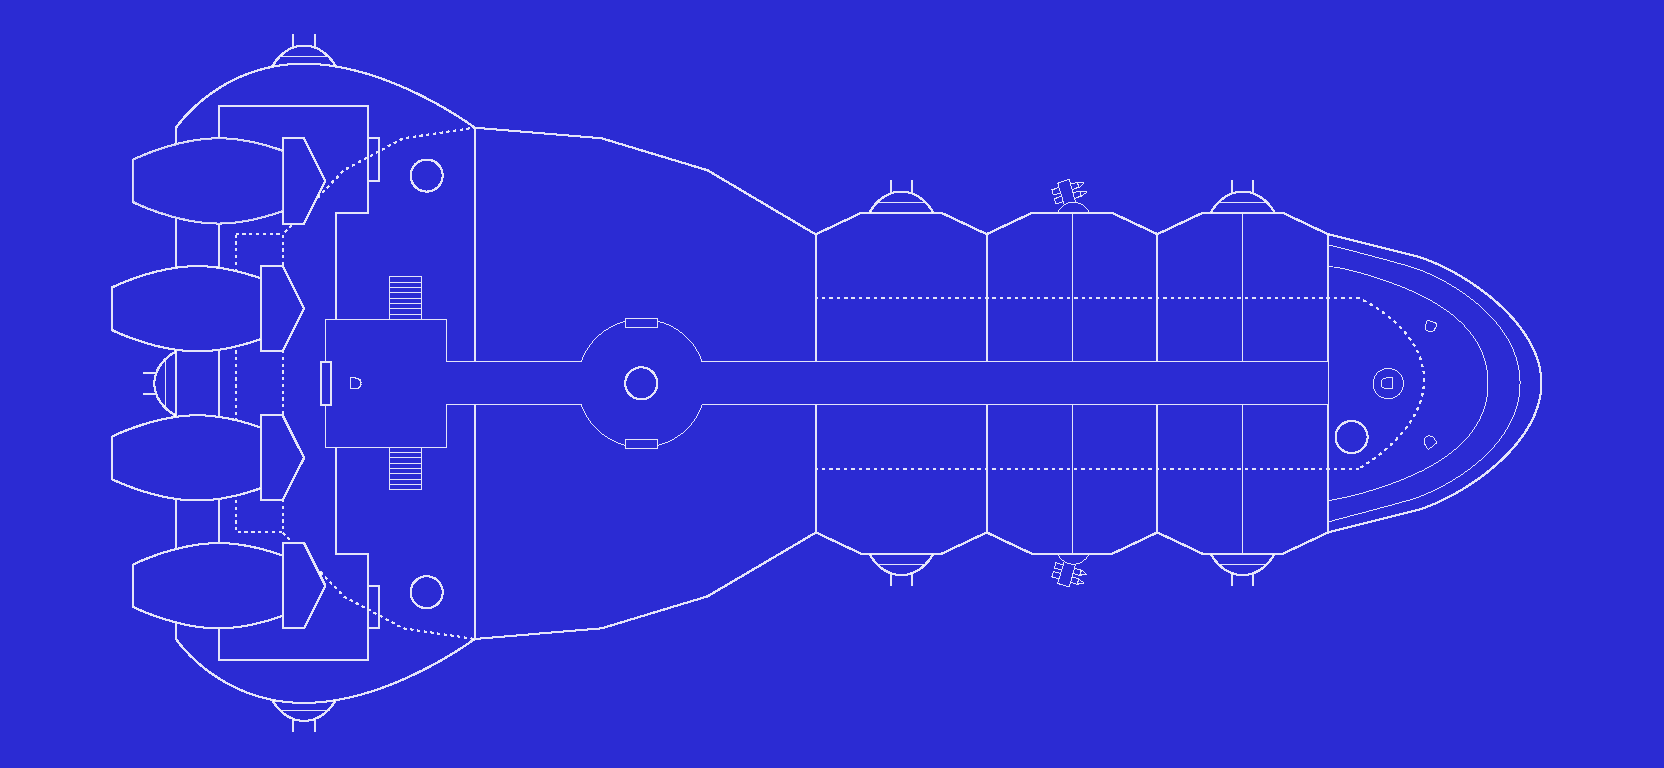 Spaceship blueprint